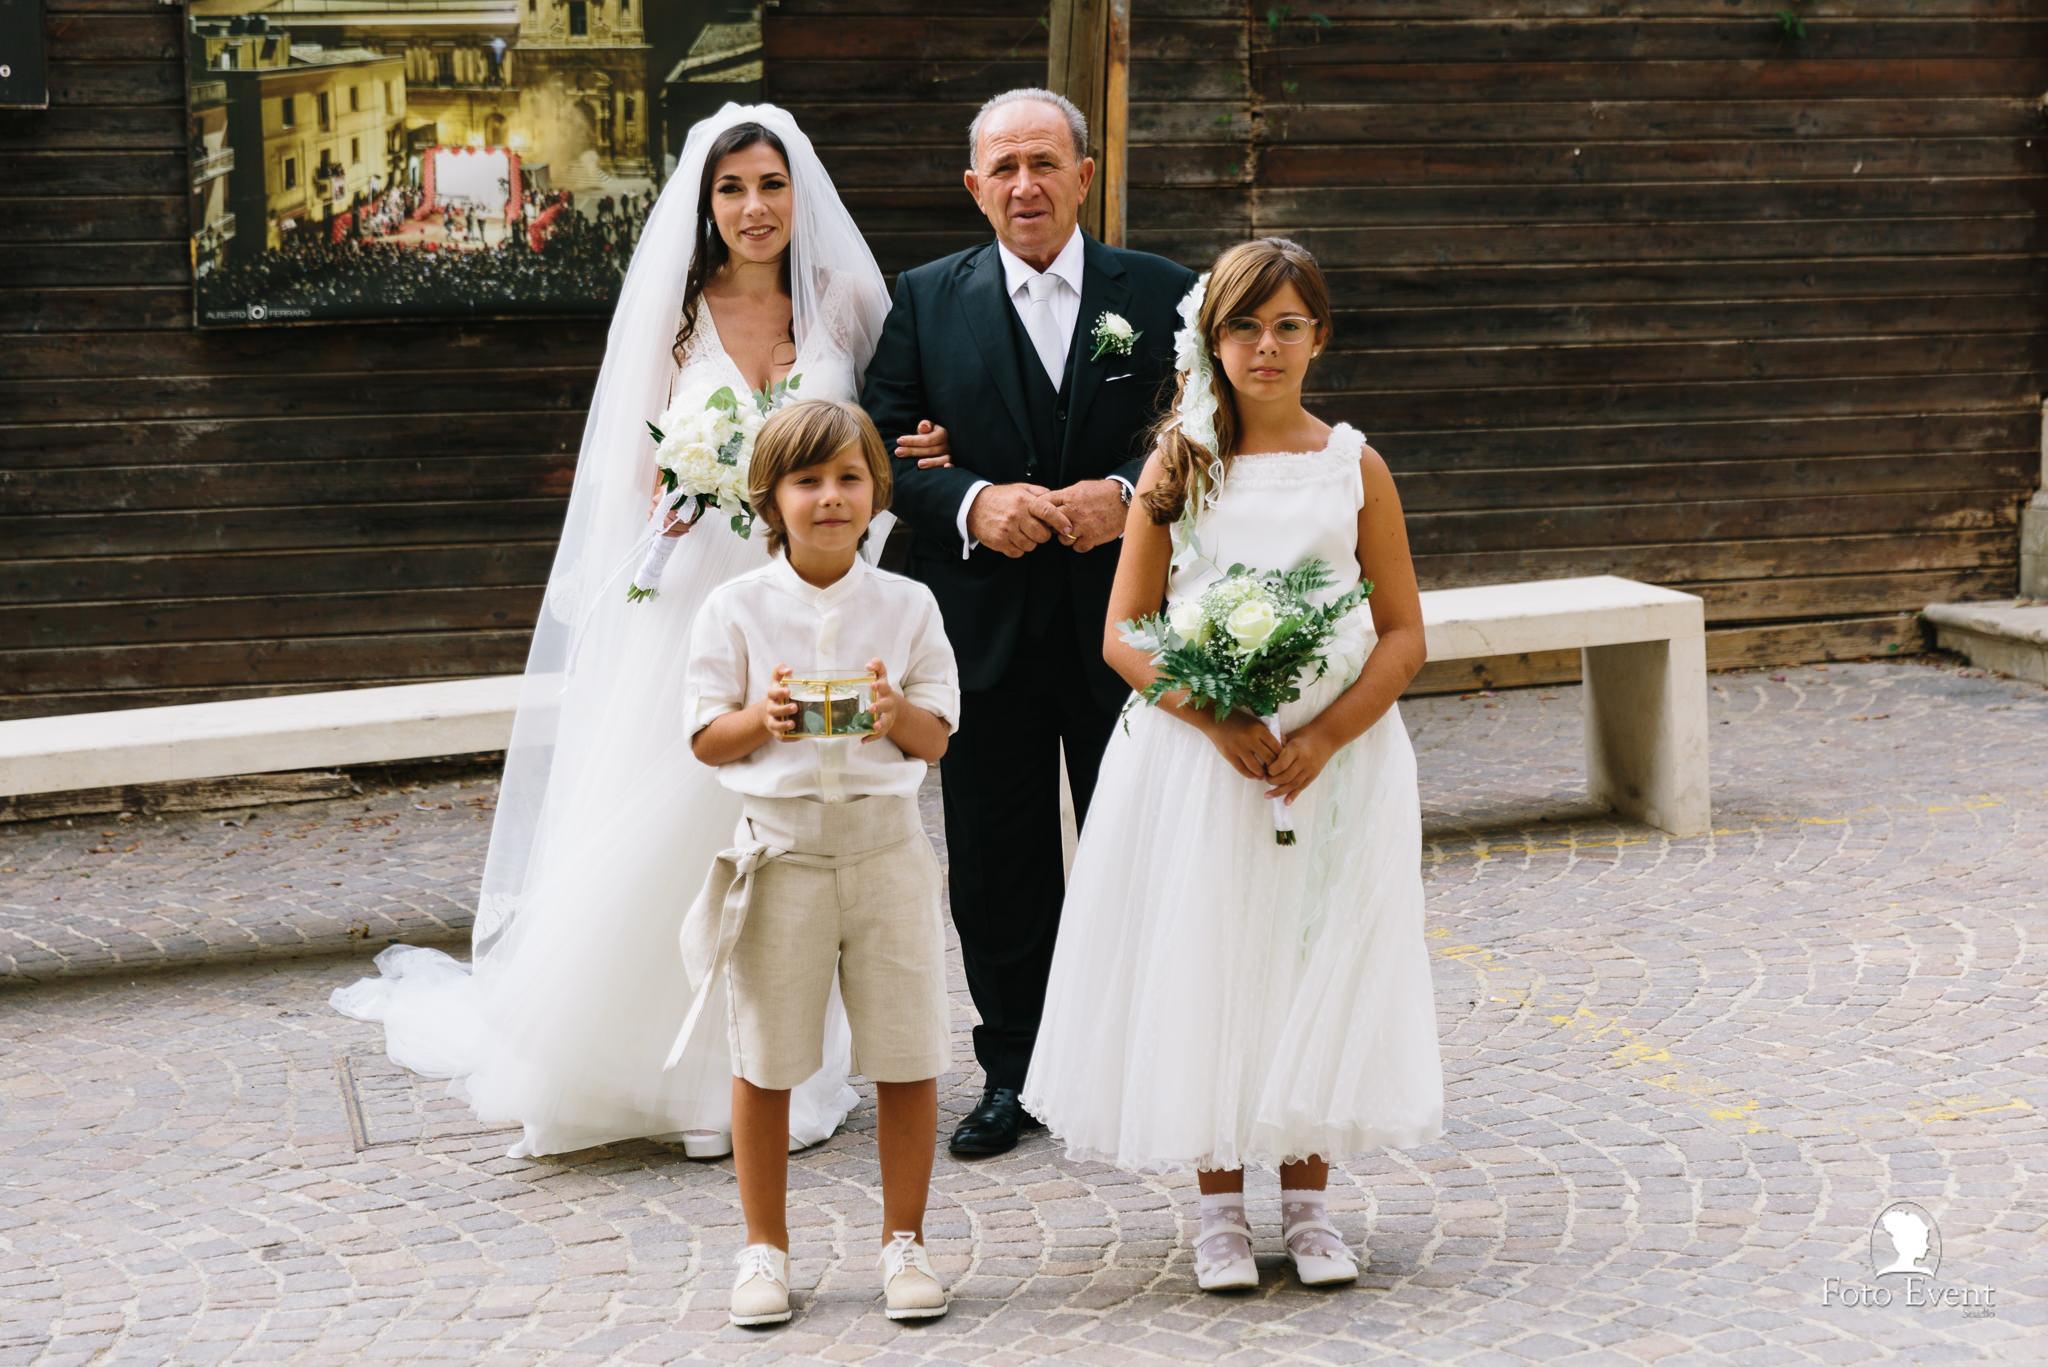 005-2019-08-23-Matrimonio-Lucia-e-Rosario-Scopelliti-5DE-1242